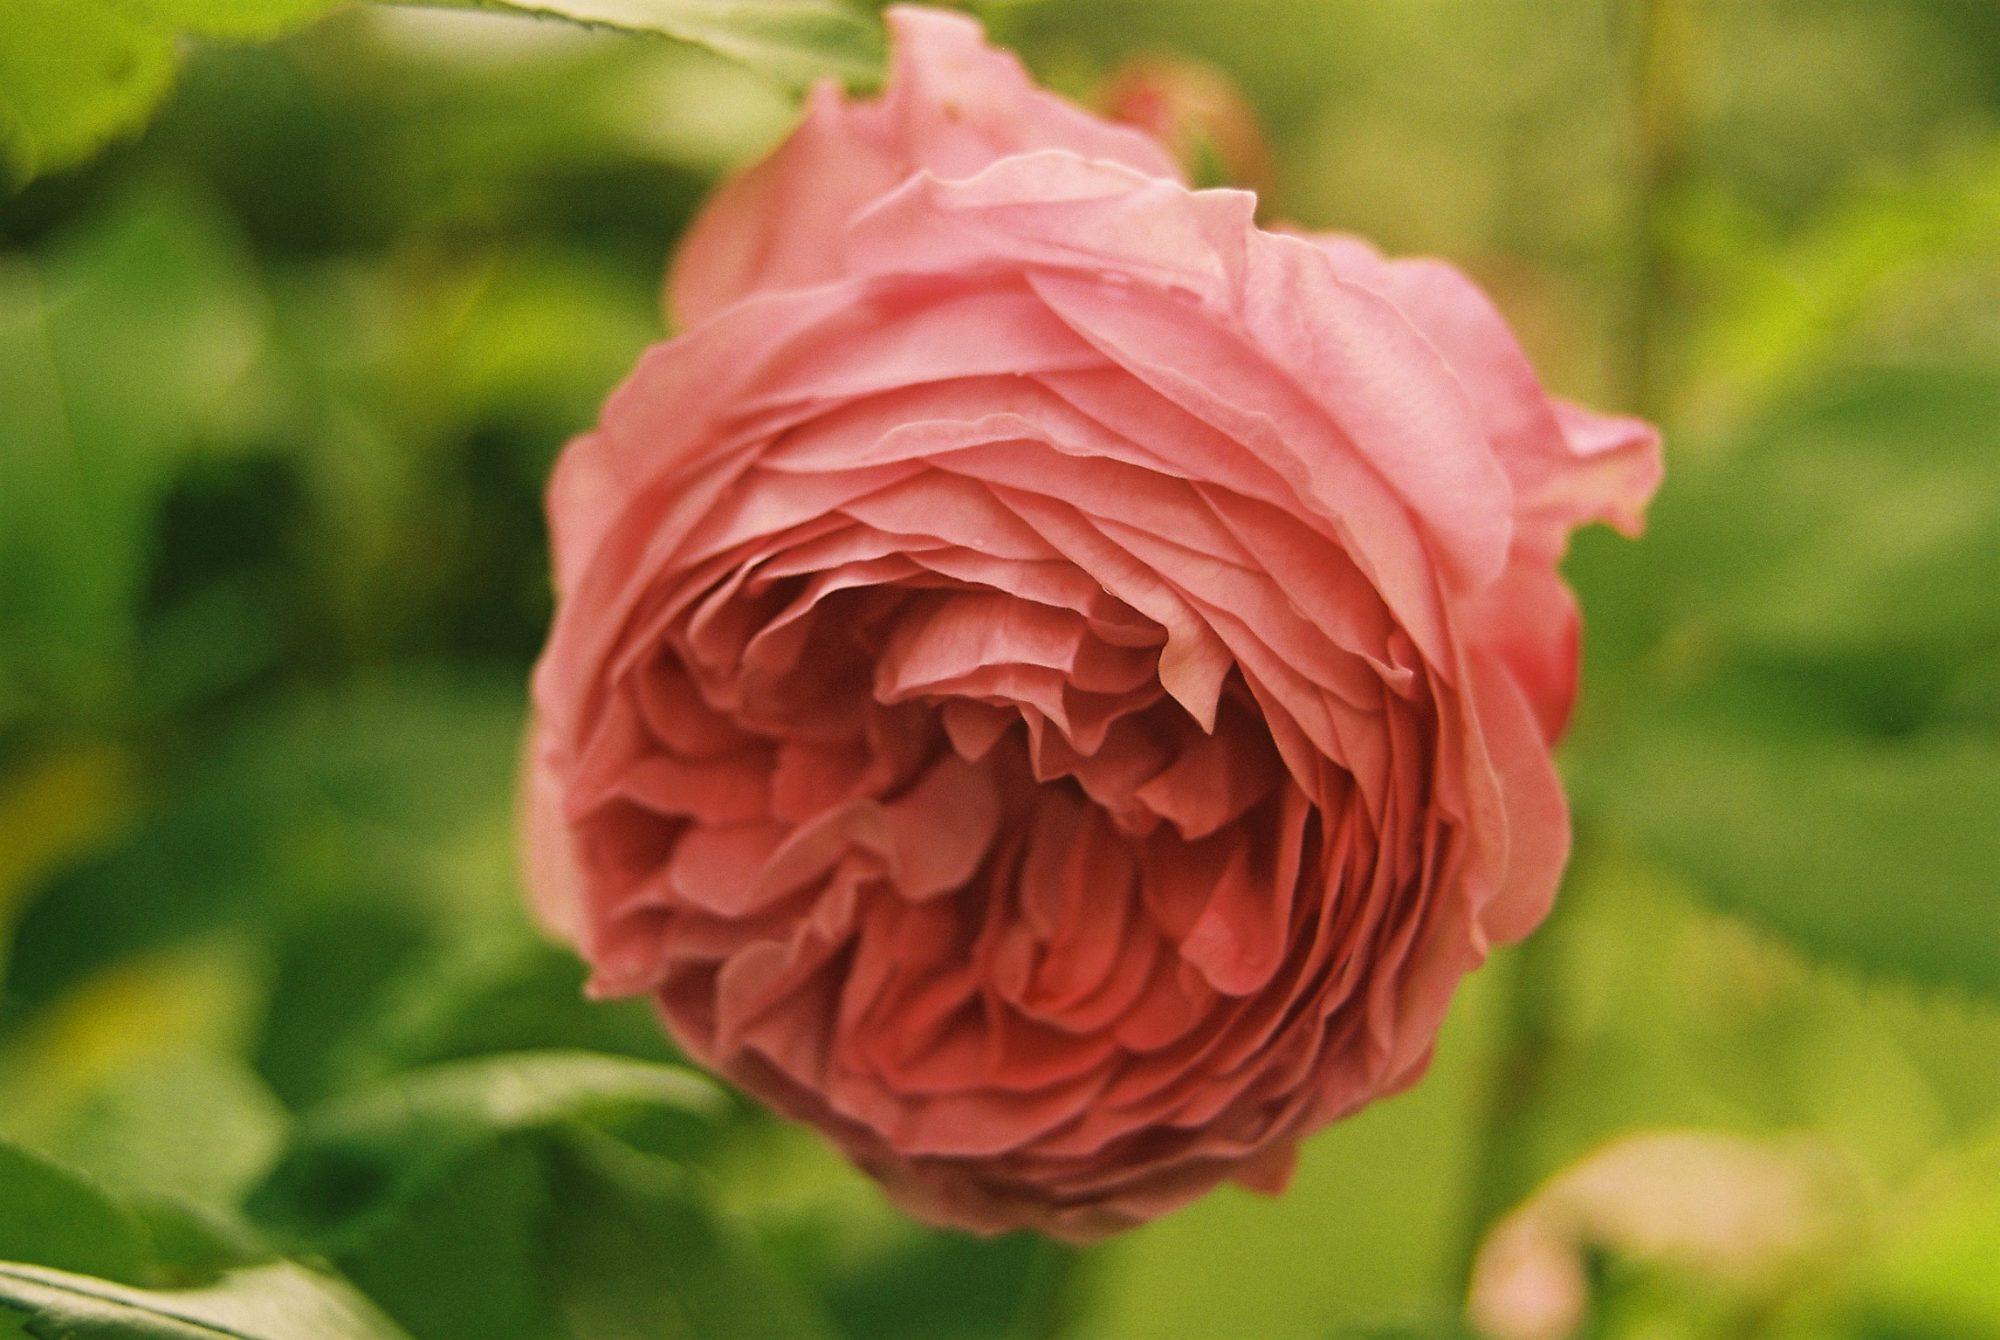 Blumen-Schulze Neuzelle